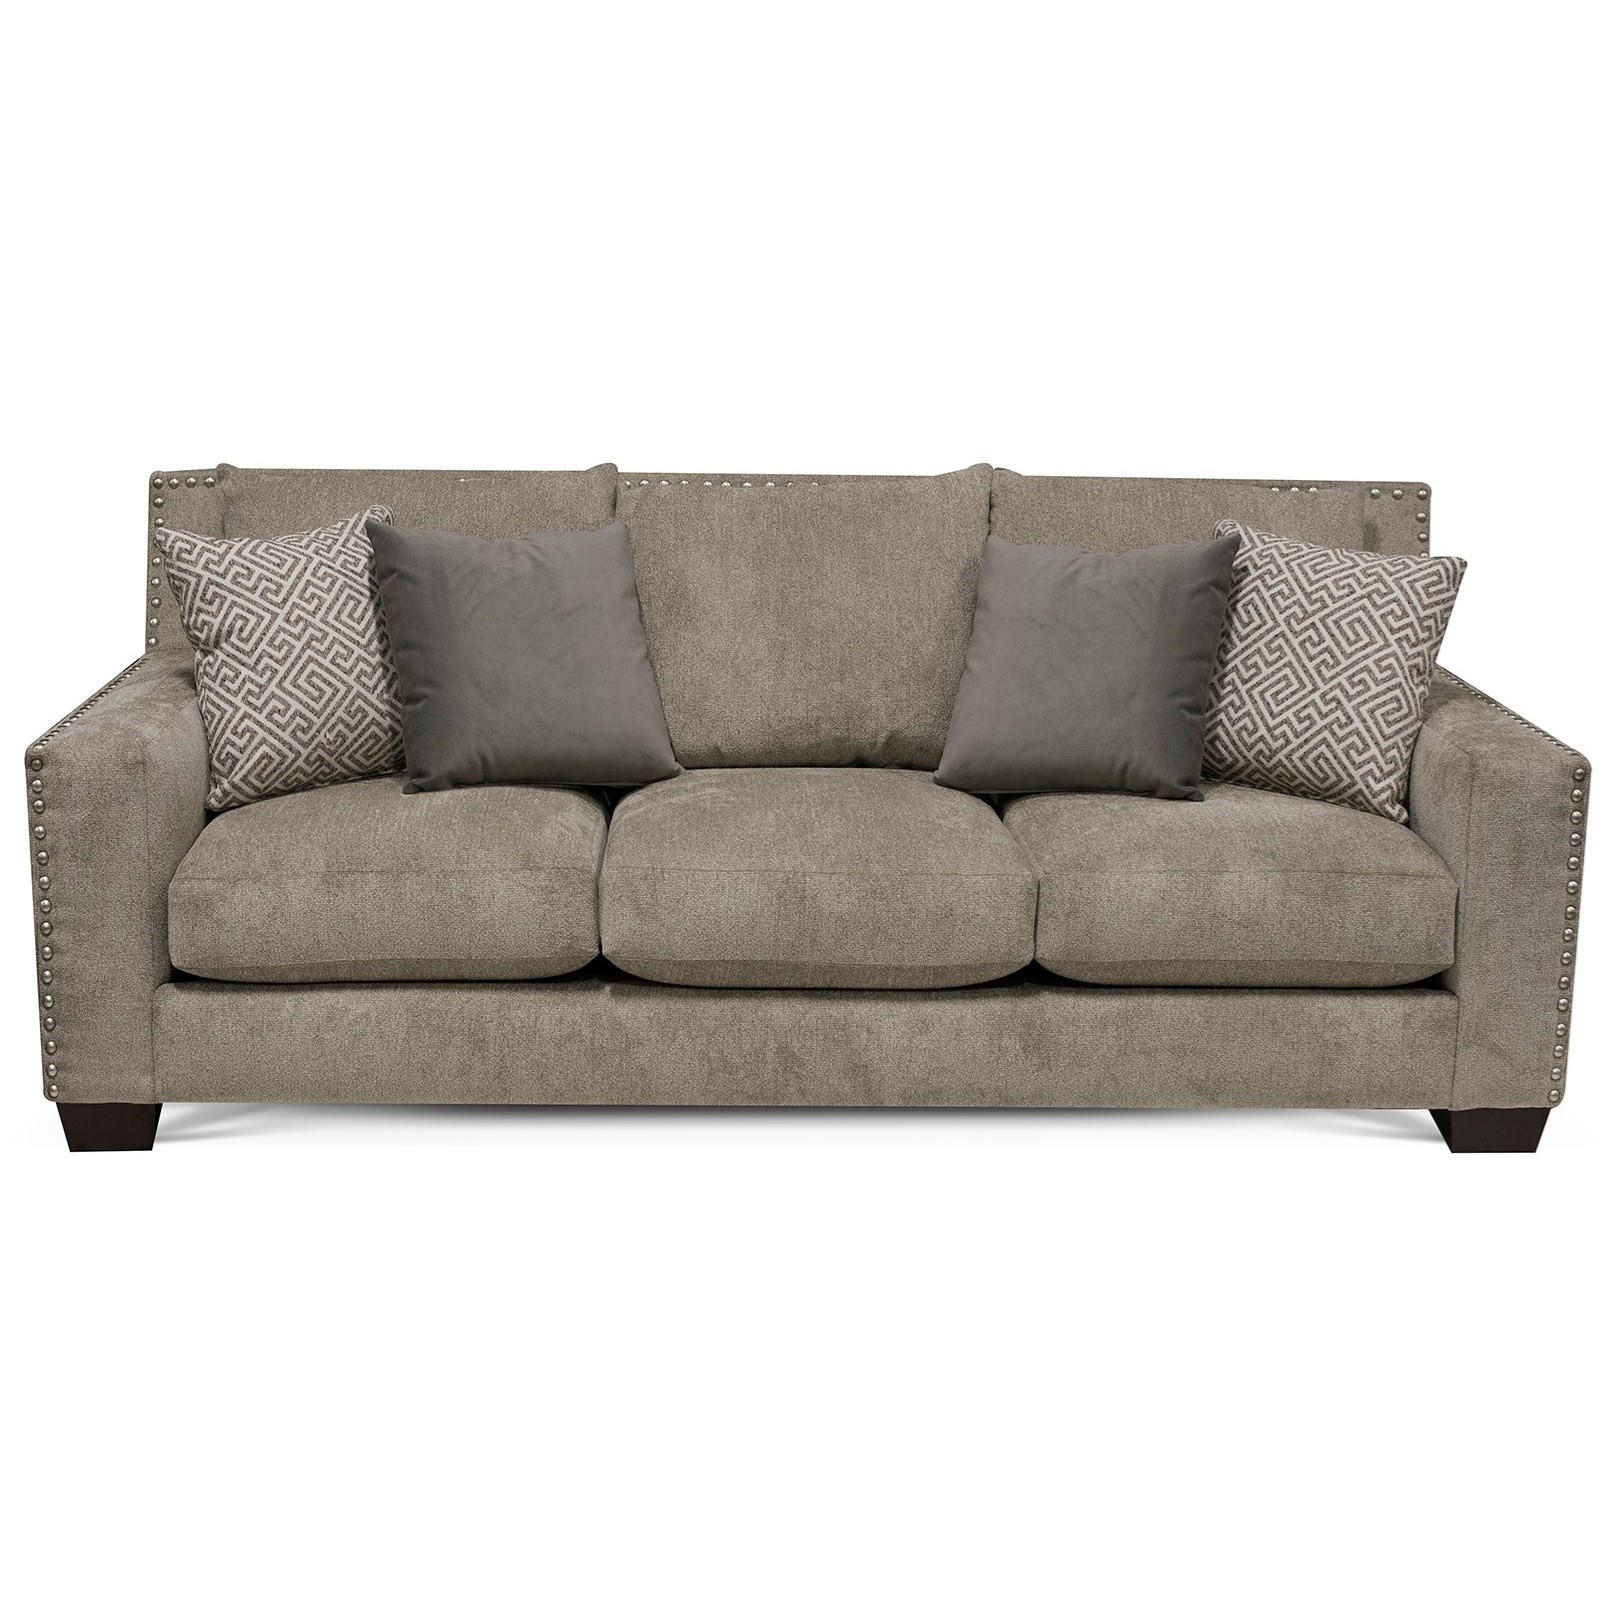 England Luckenbach Contemporary Sofa With Nailhead Trim